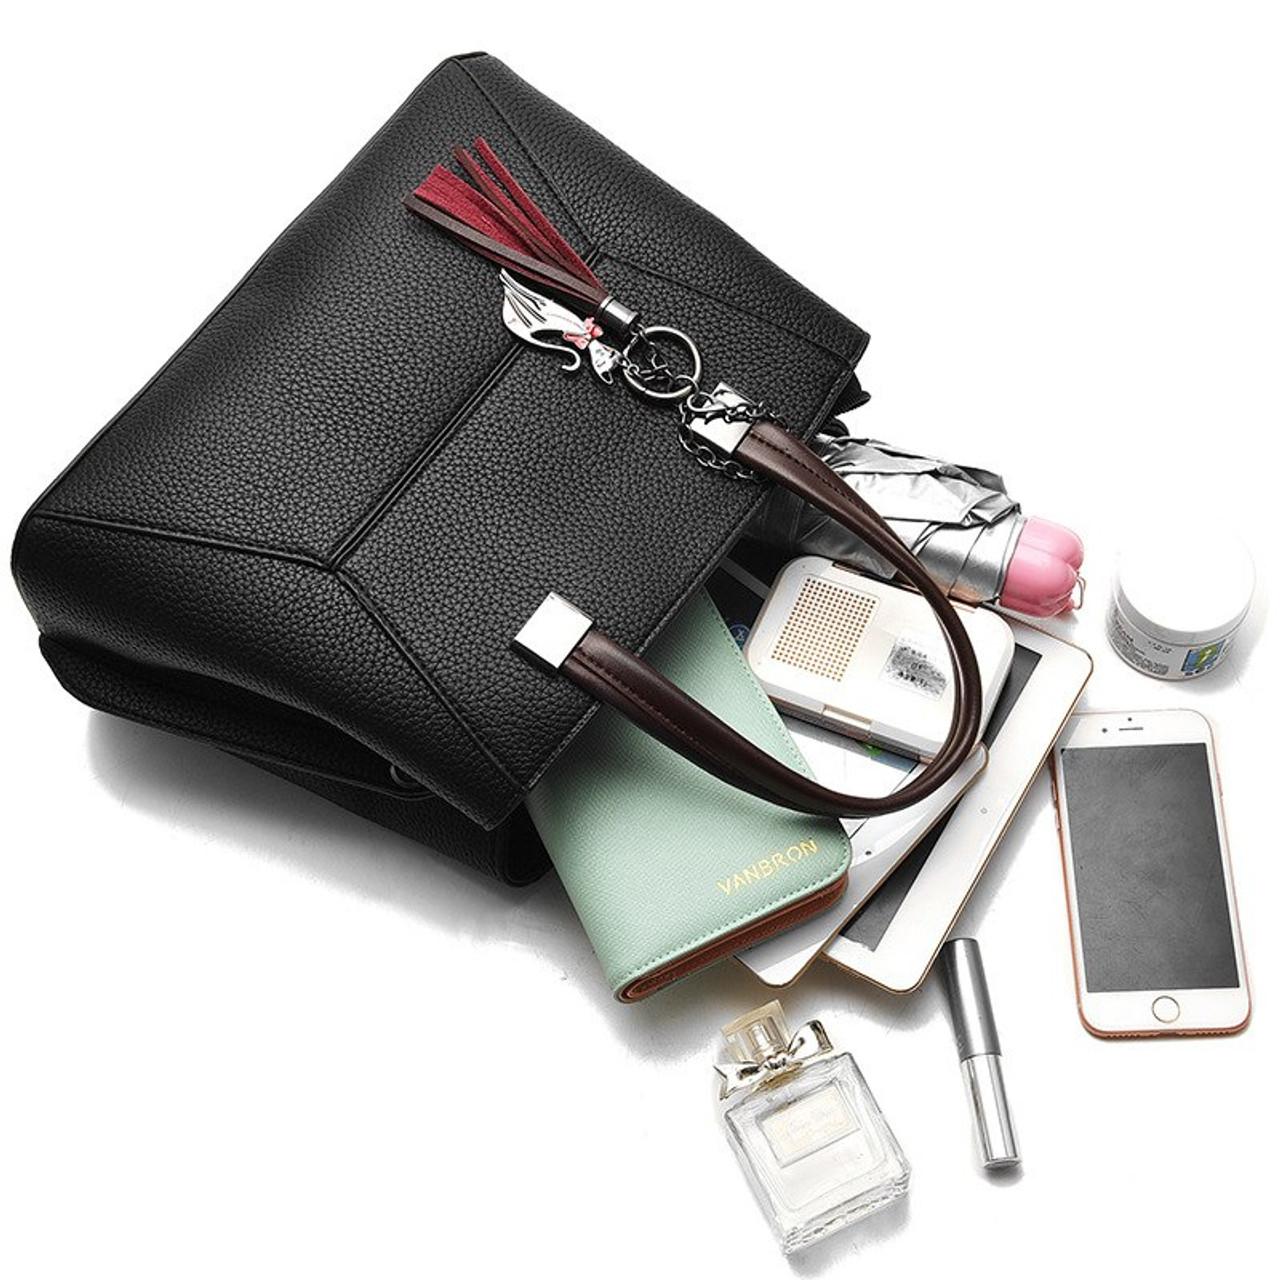 ... Fashion Tassel 2018 Women Handbag Luxury Brand Clutch Female Crossbody  Bags Soft Leather Designer Large Lady ... fc31cbed736bb